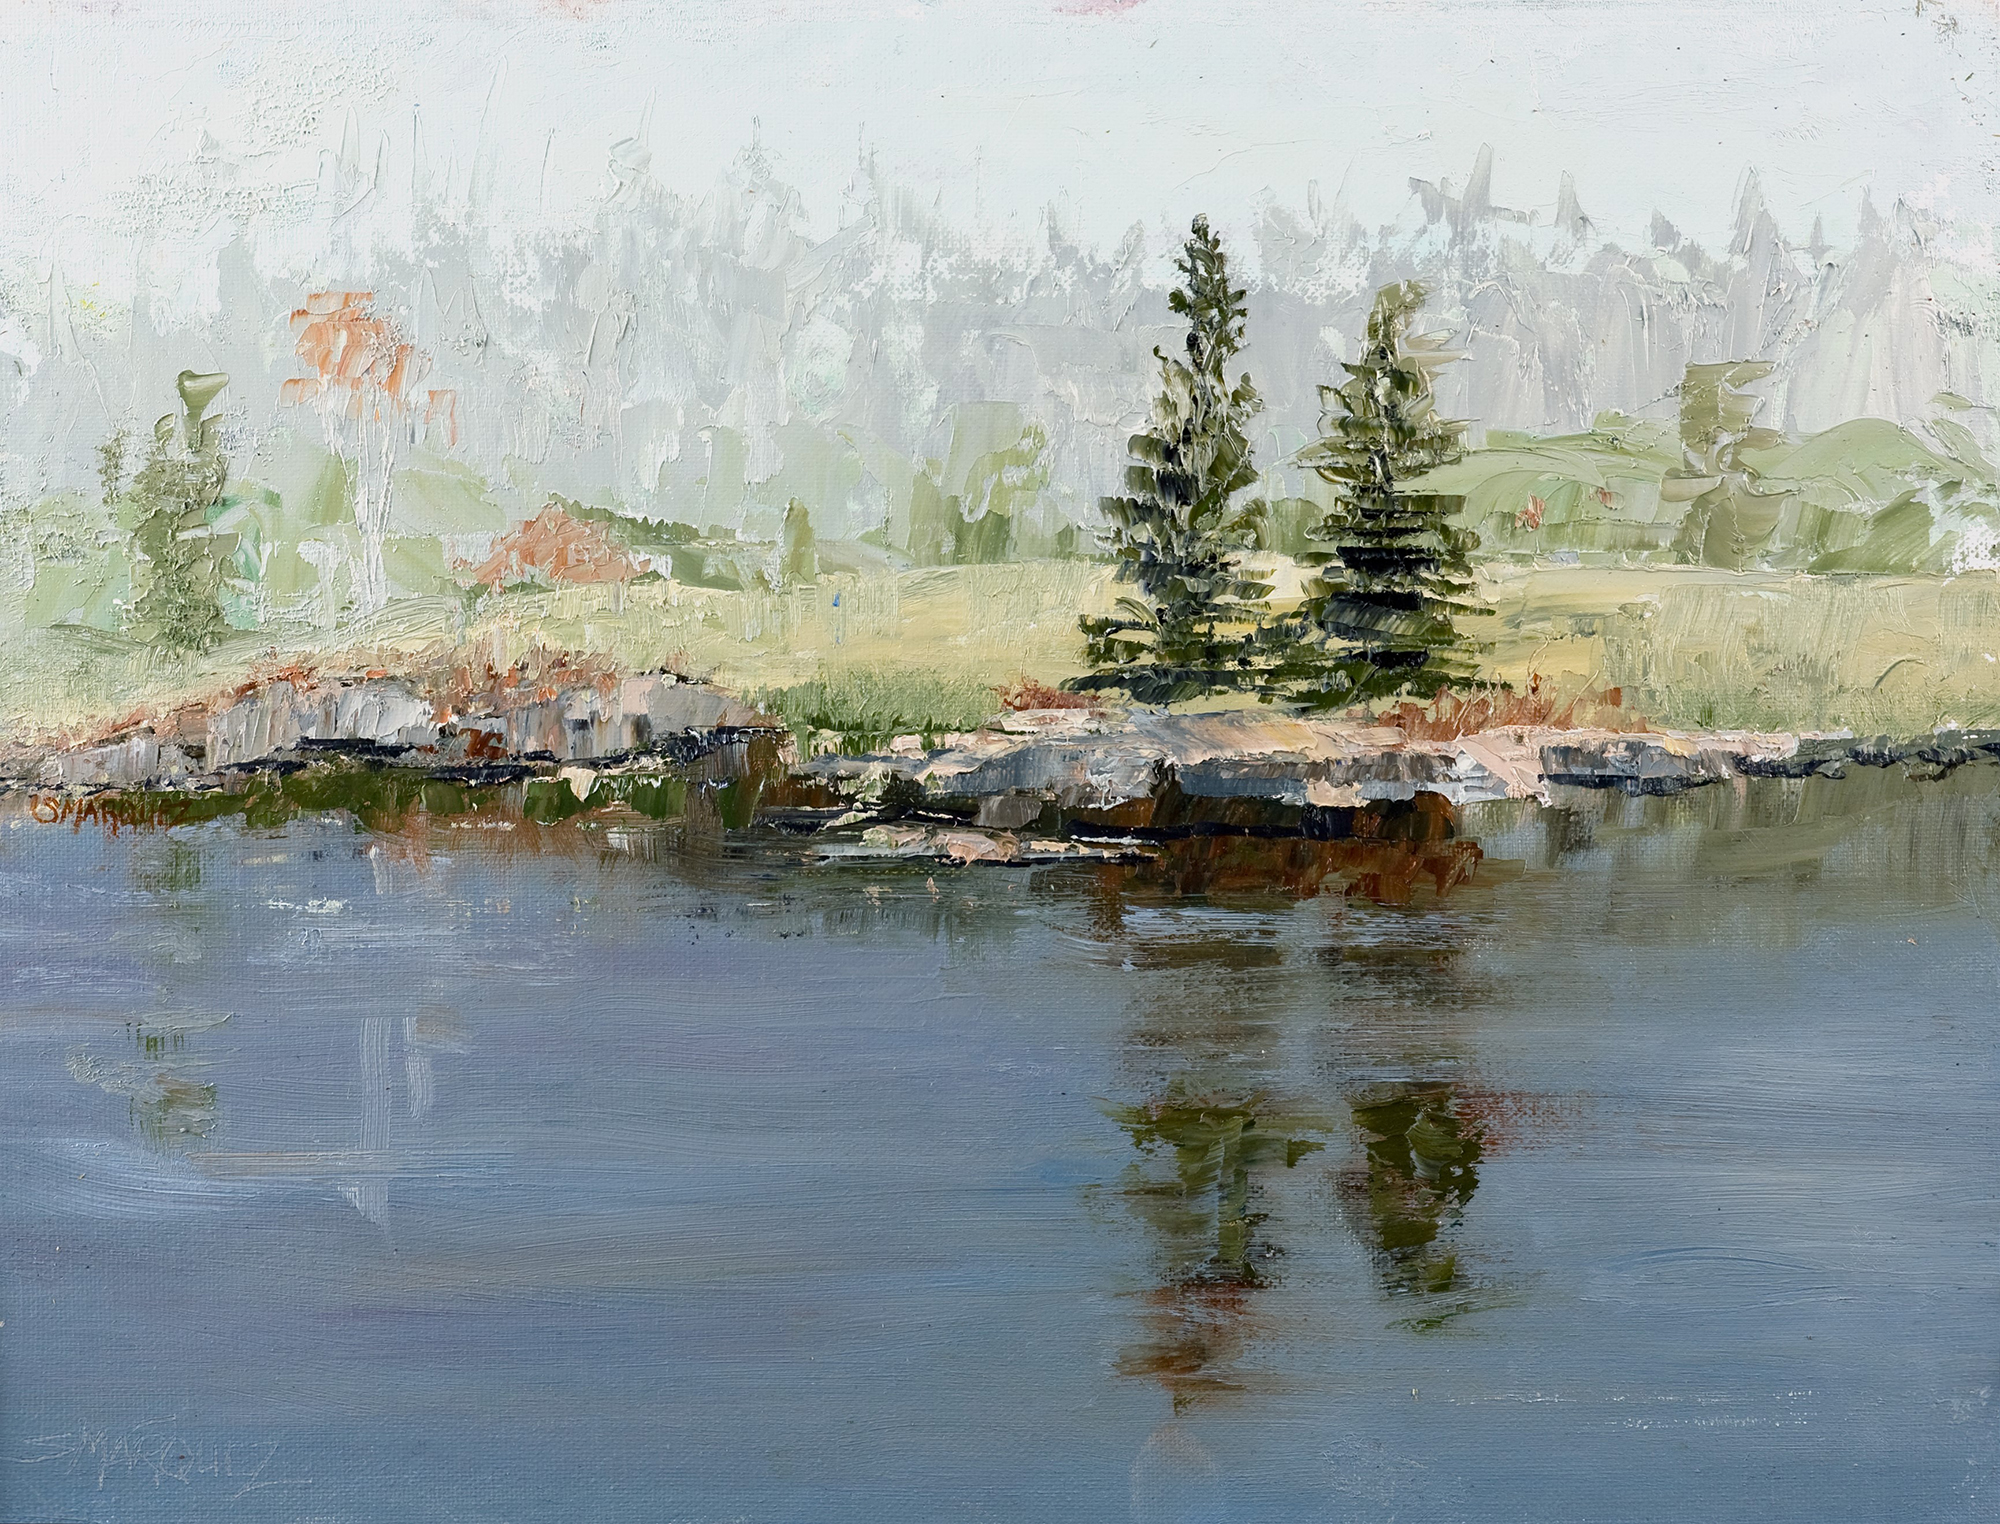 Misty morning plein air oil painting